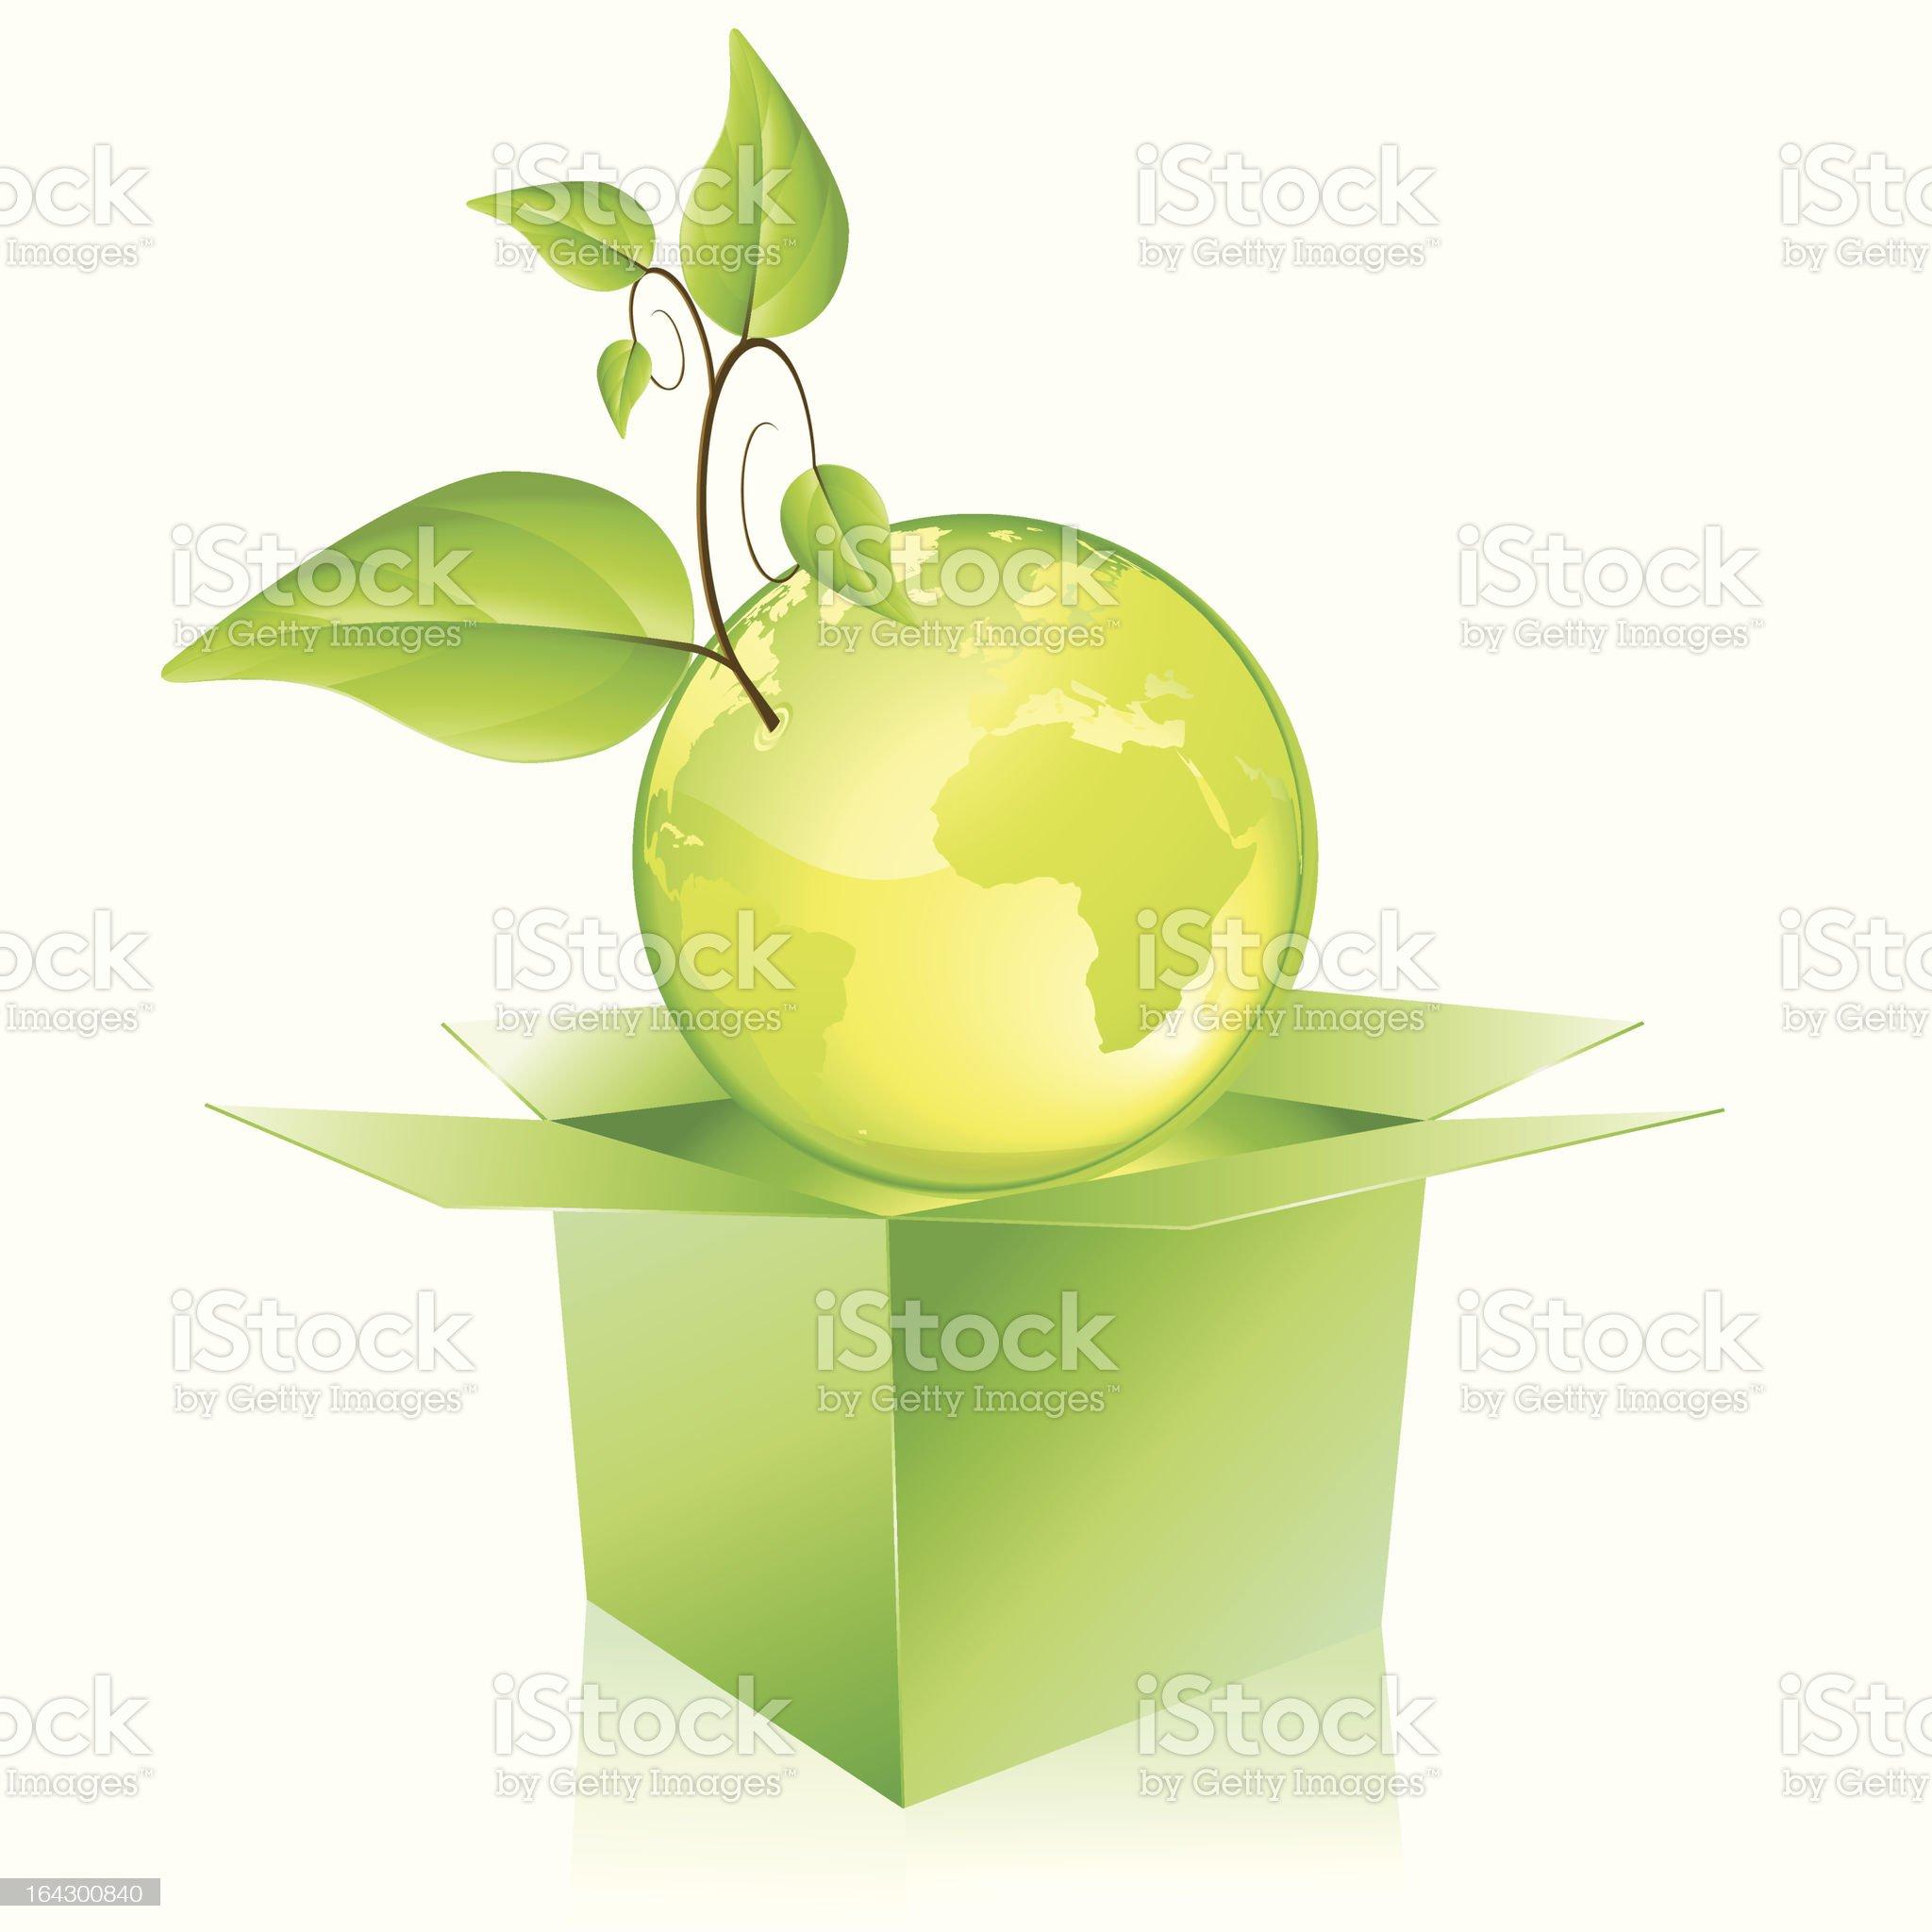 Green planet royalty-free stock vector art